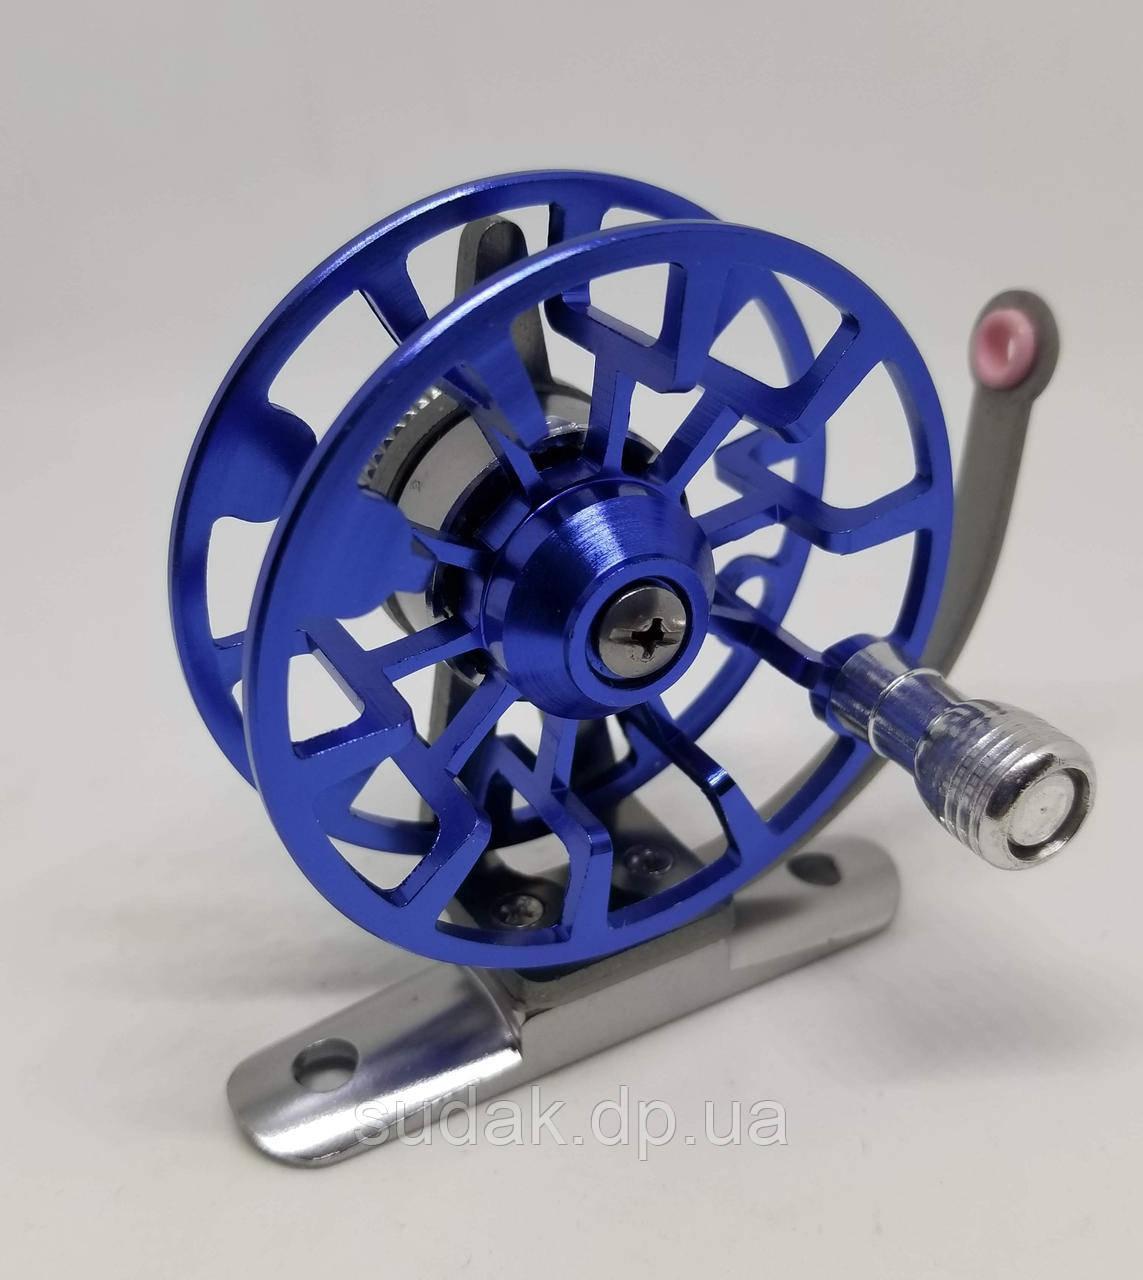 Катушка инерционная Optimum Relief-3 (53mm)